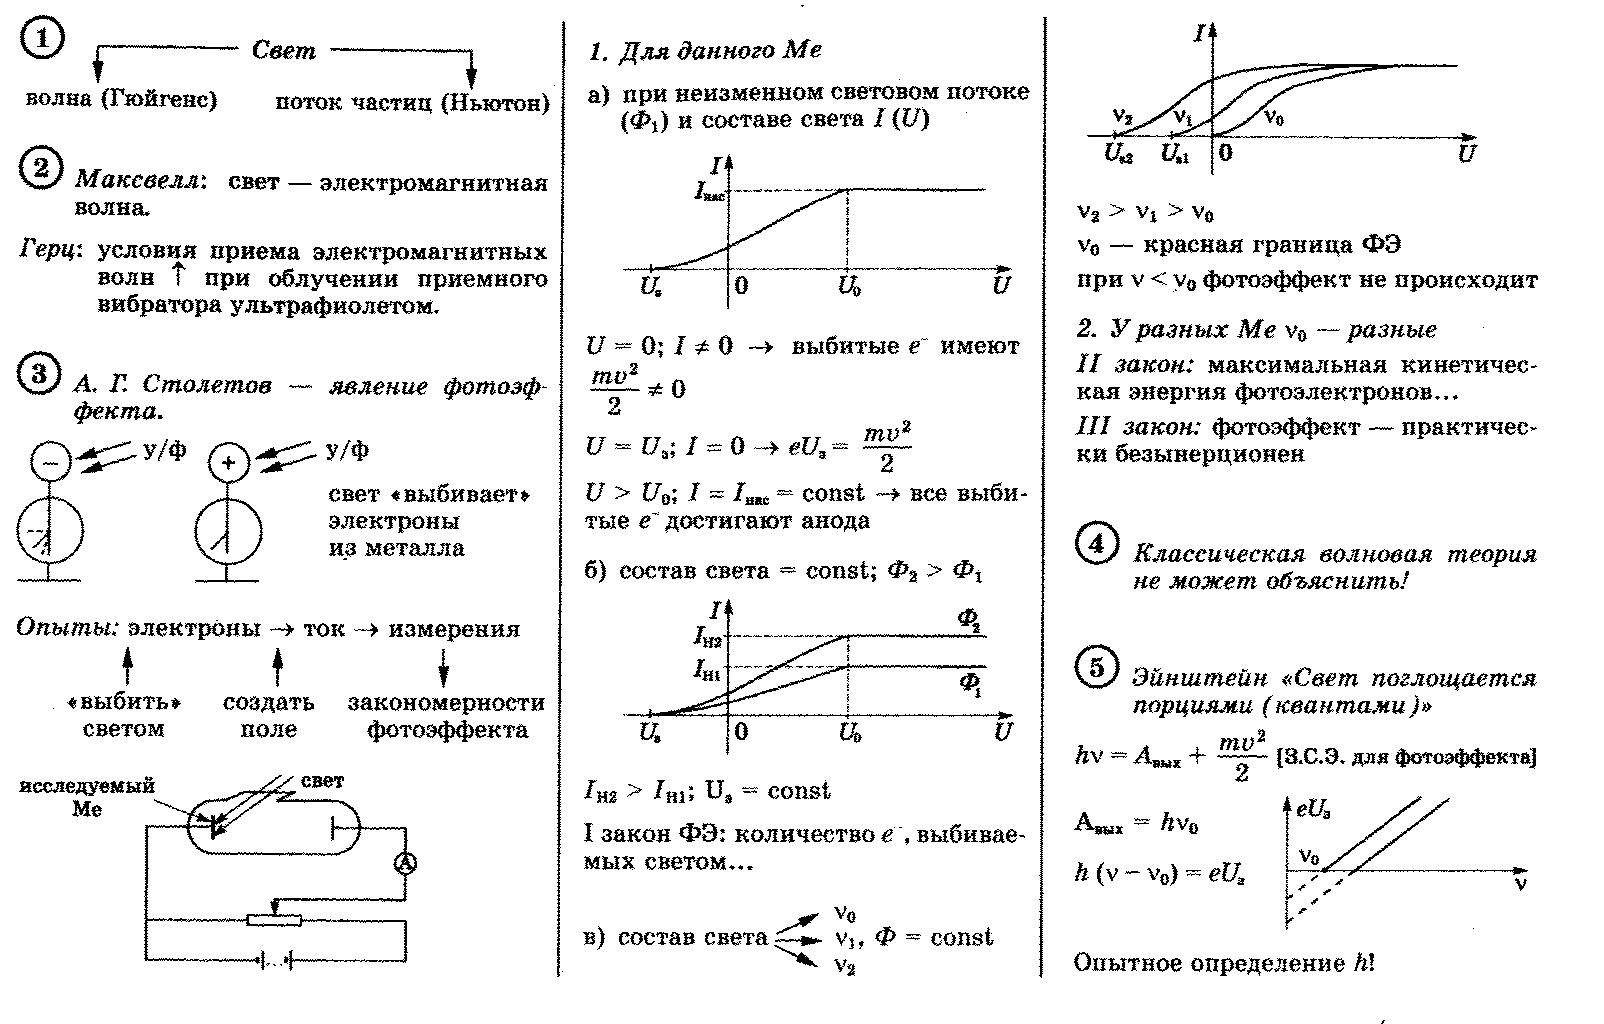 области фотоэффект физика формулы скажу